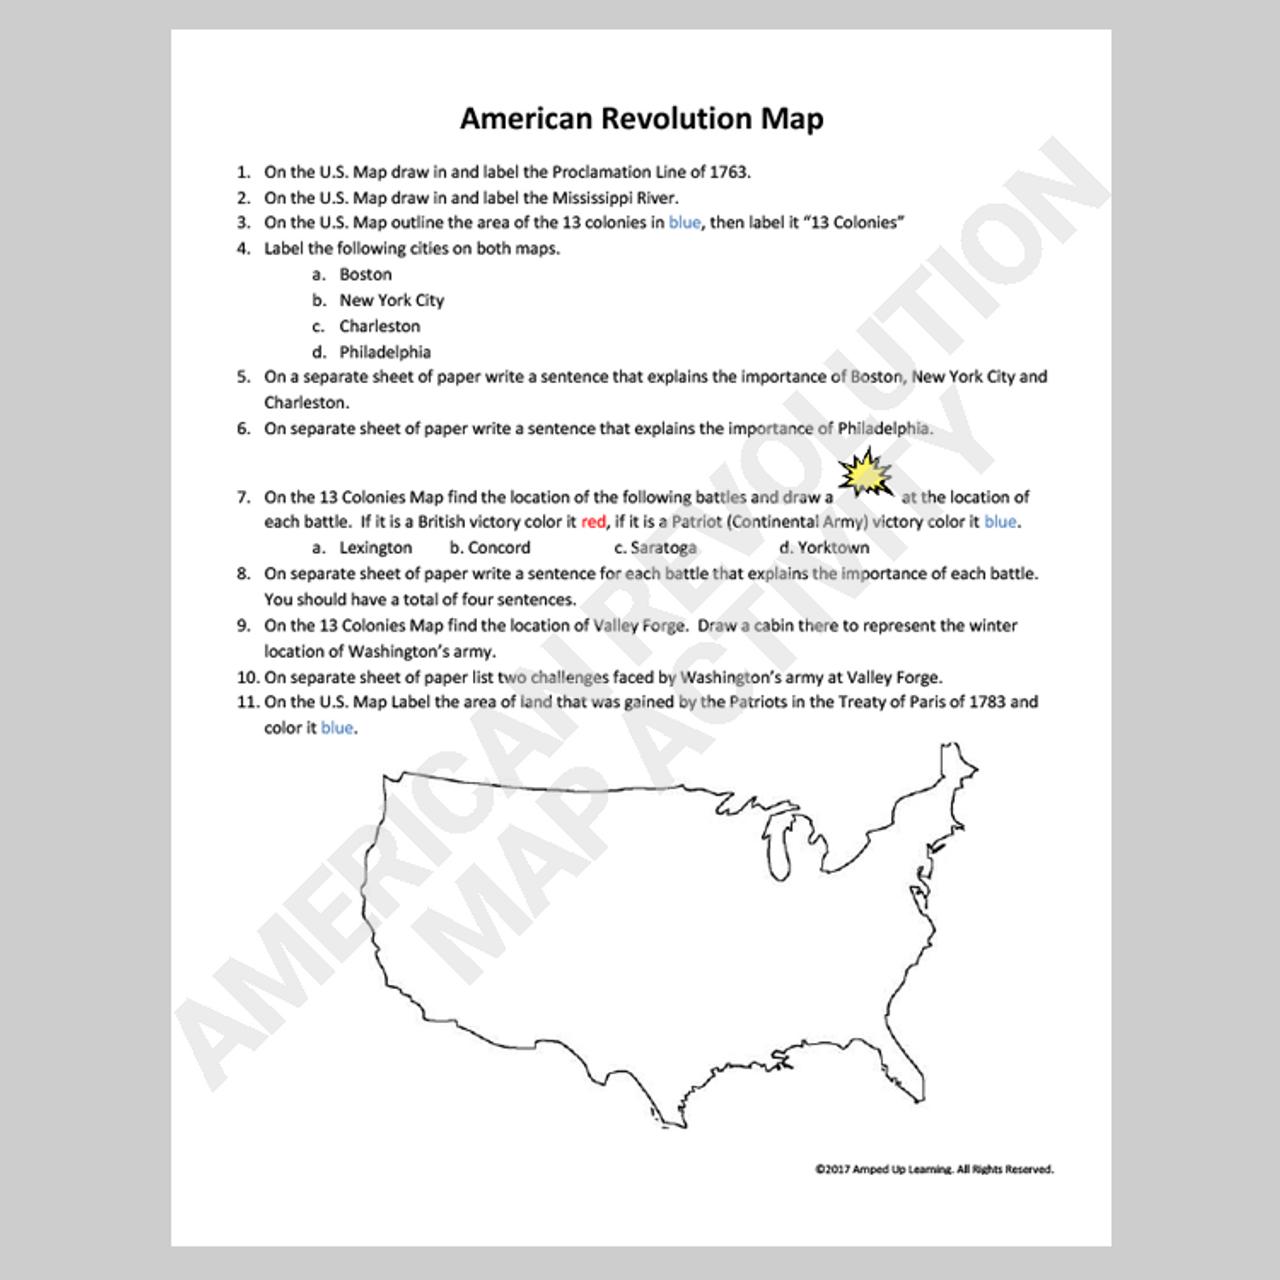 American Revolution Map Activity - FREE